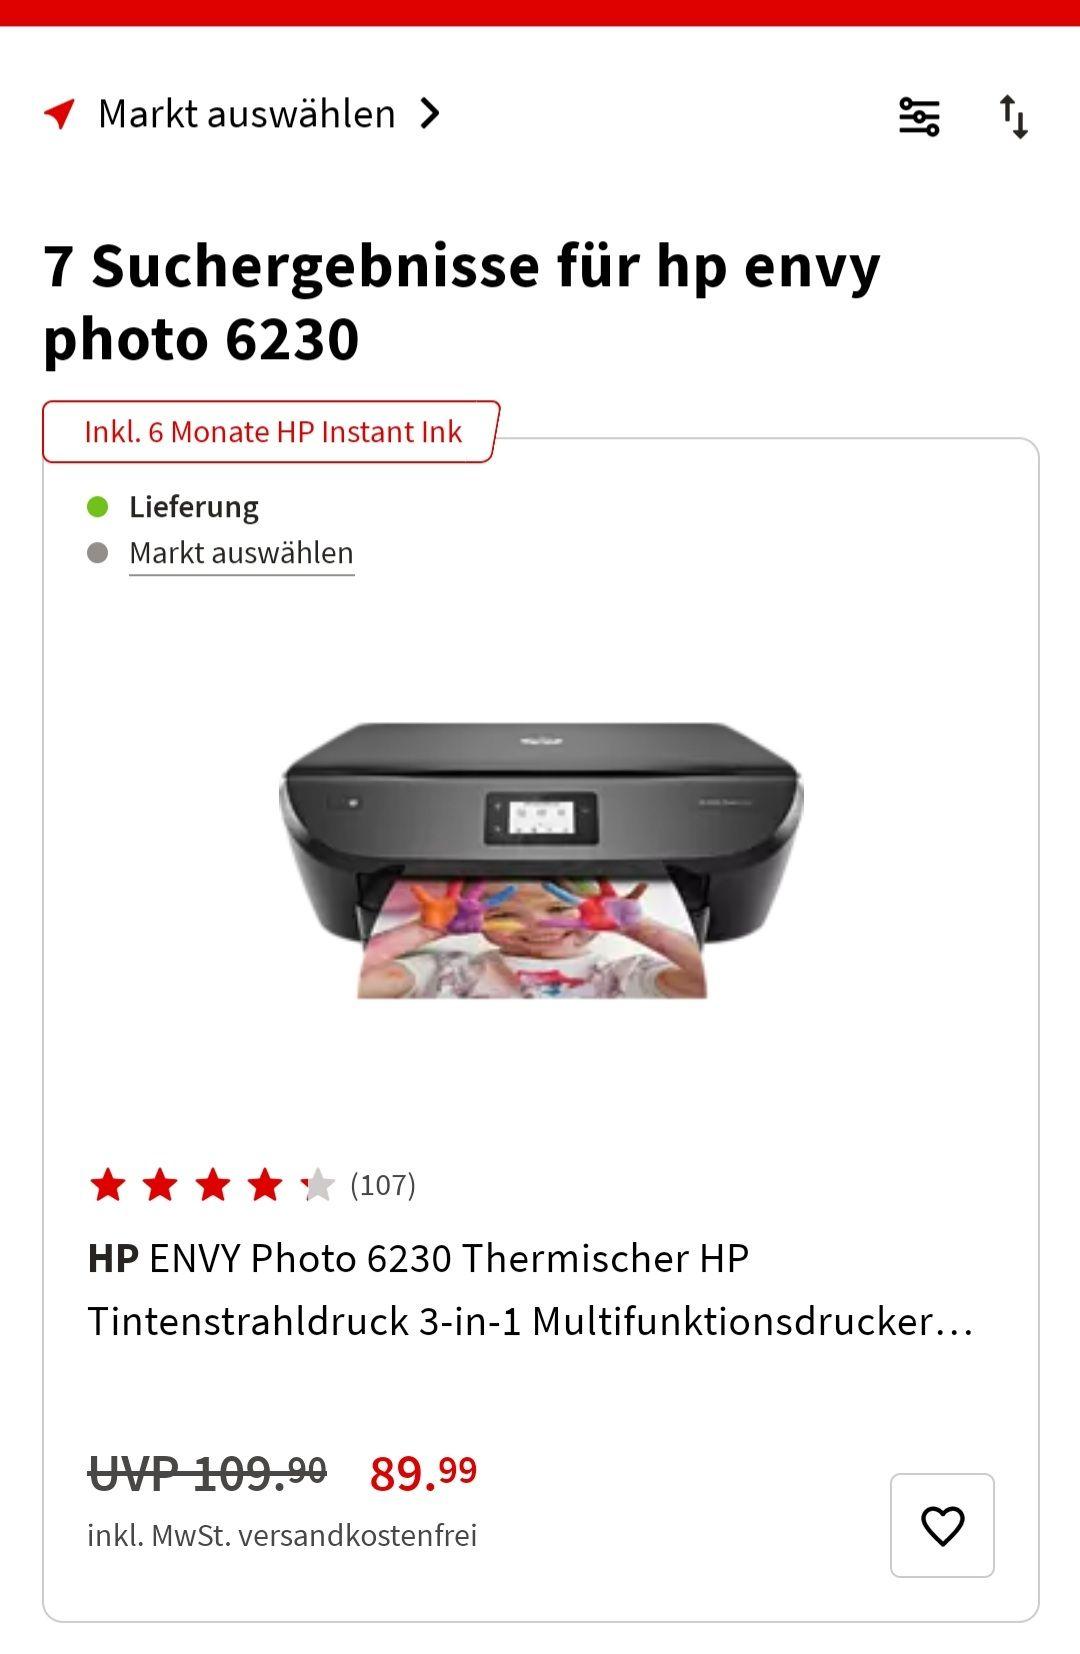 HP Envy Photo 6230 3 in 1 Drucker Media Markt 6 Monate Instant Ink Tinten Abo